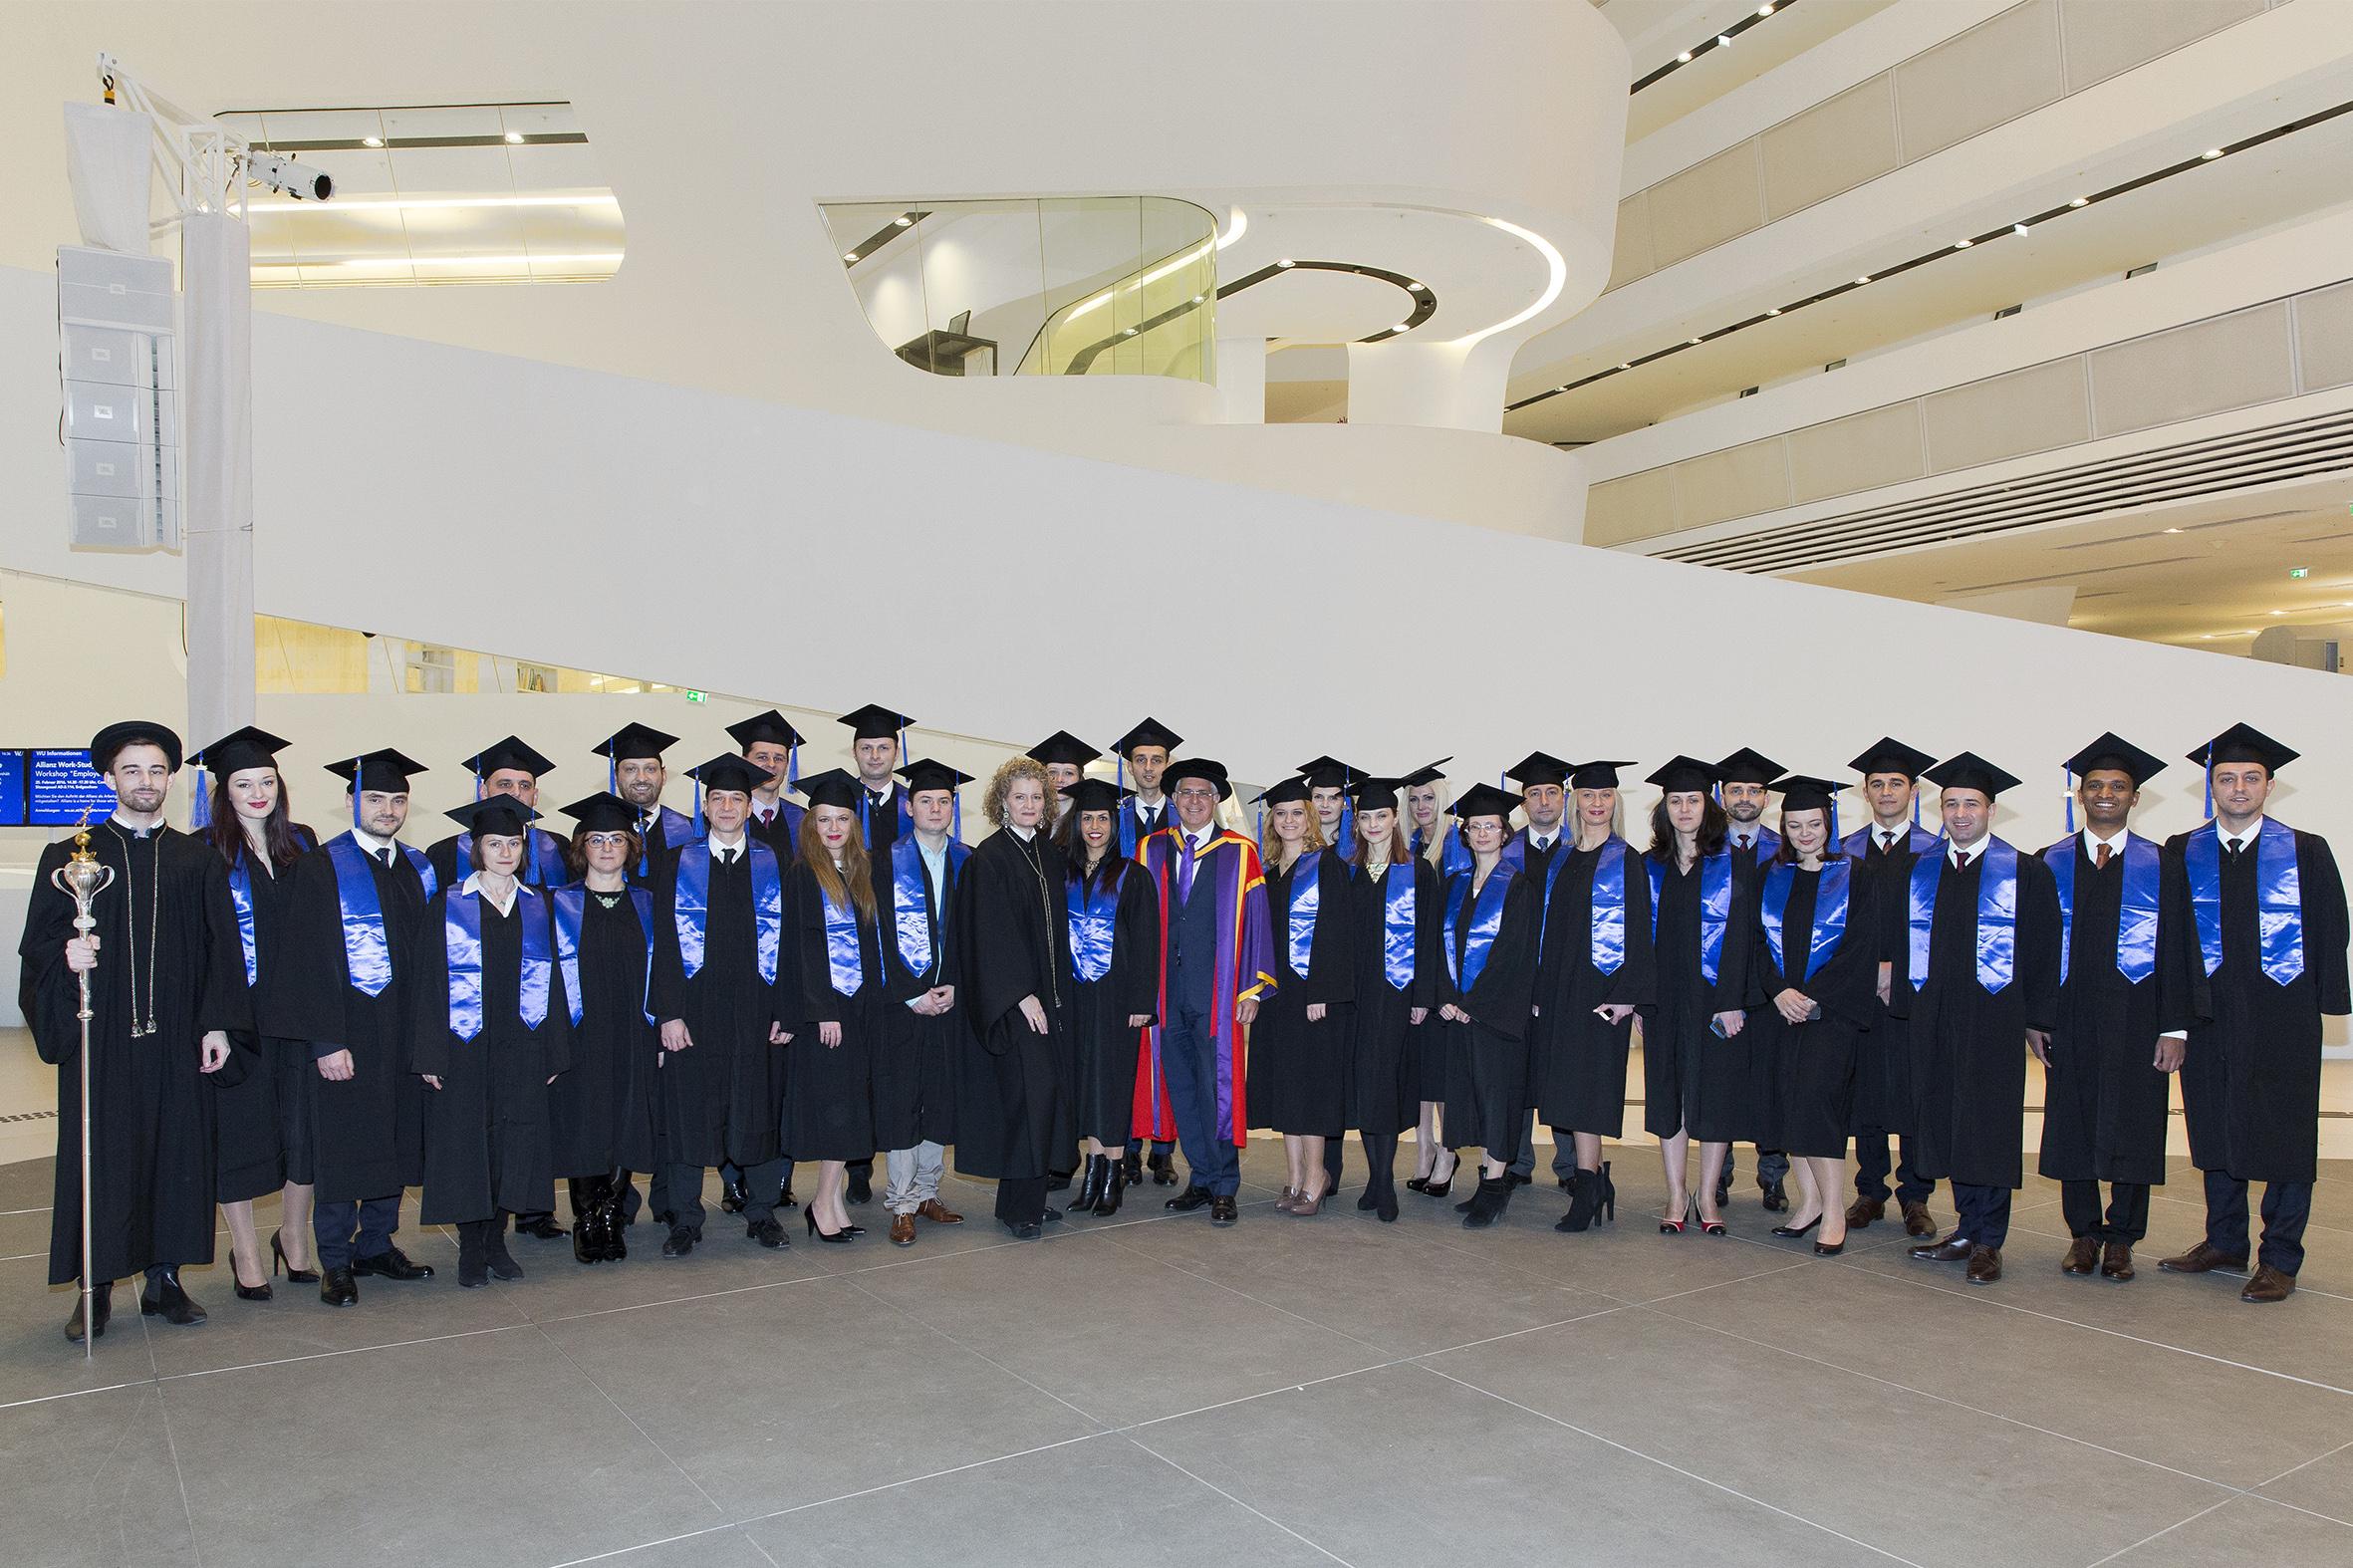 160130_Graduation_005